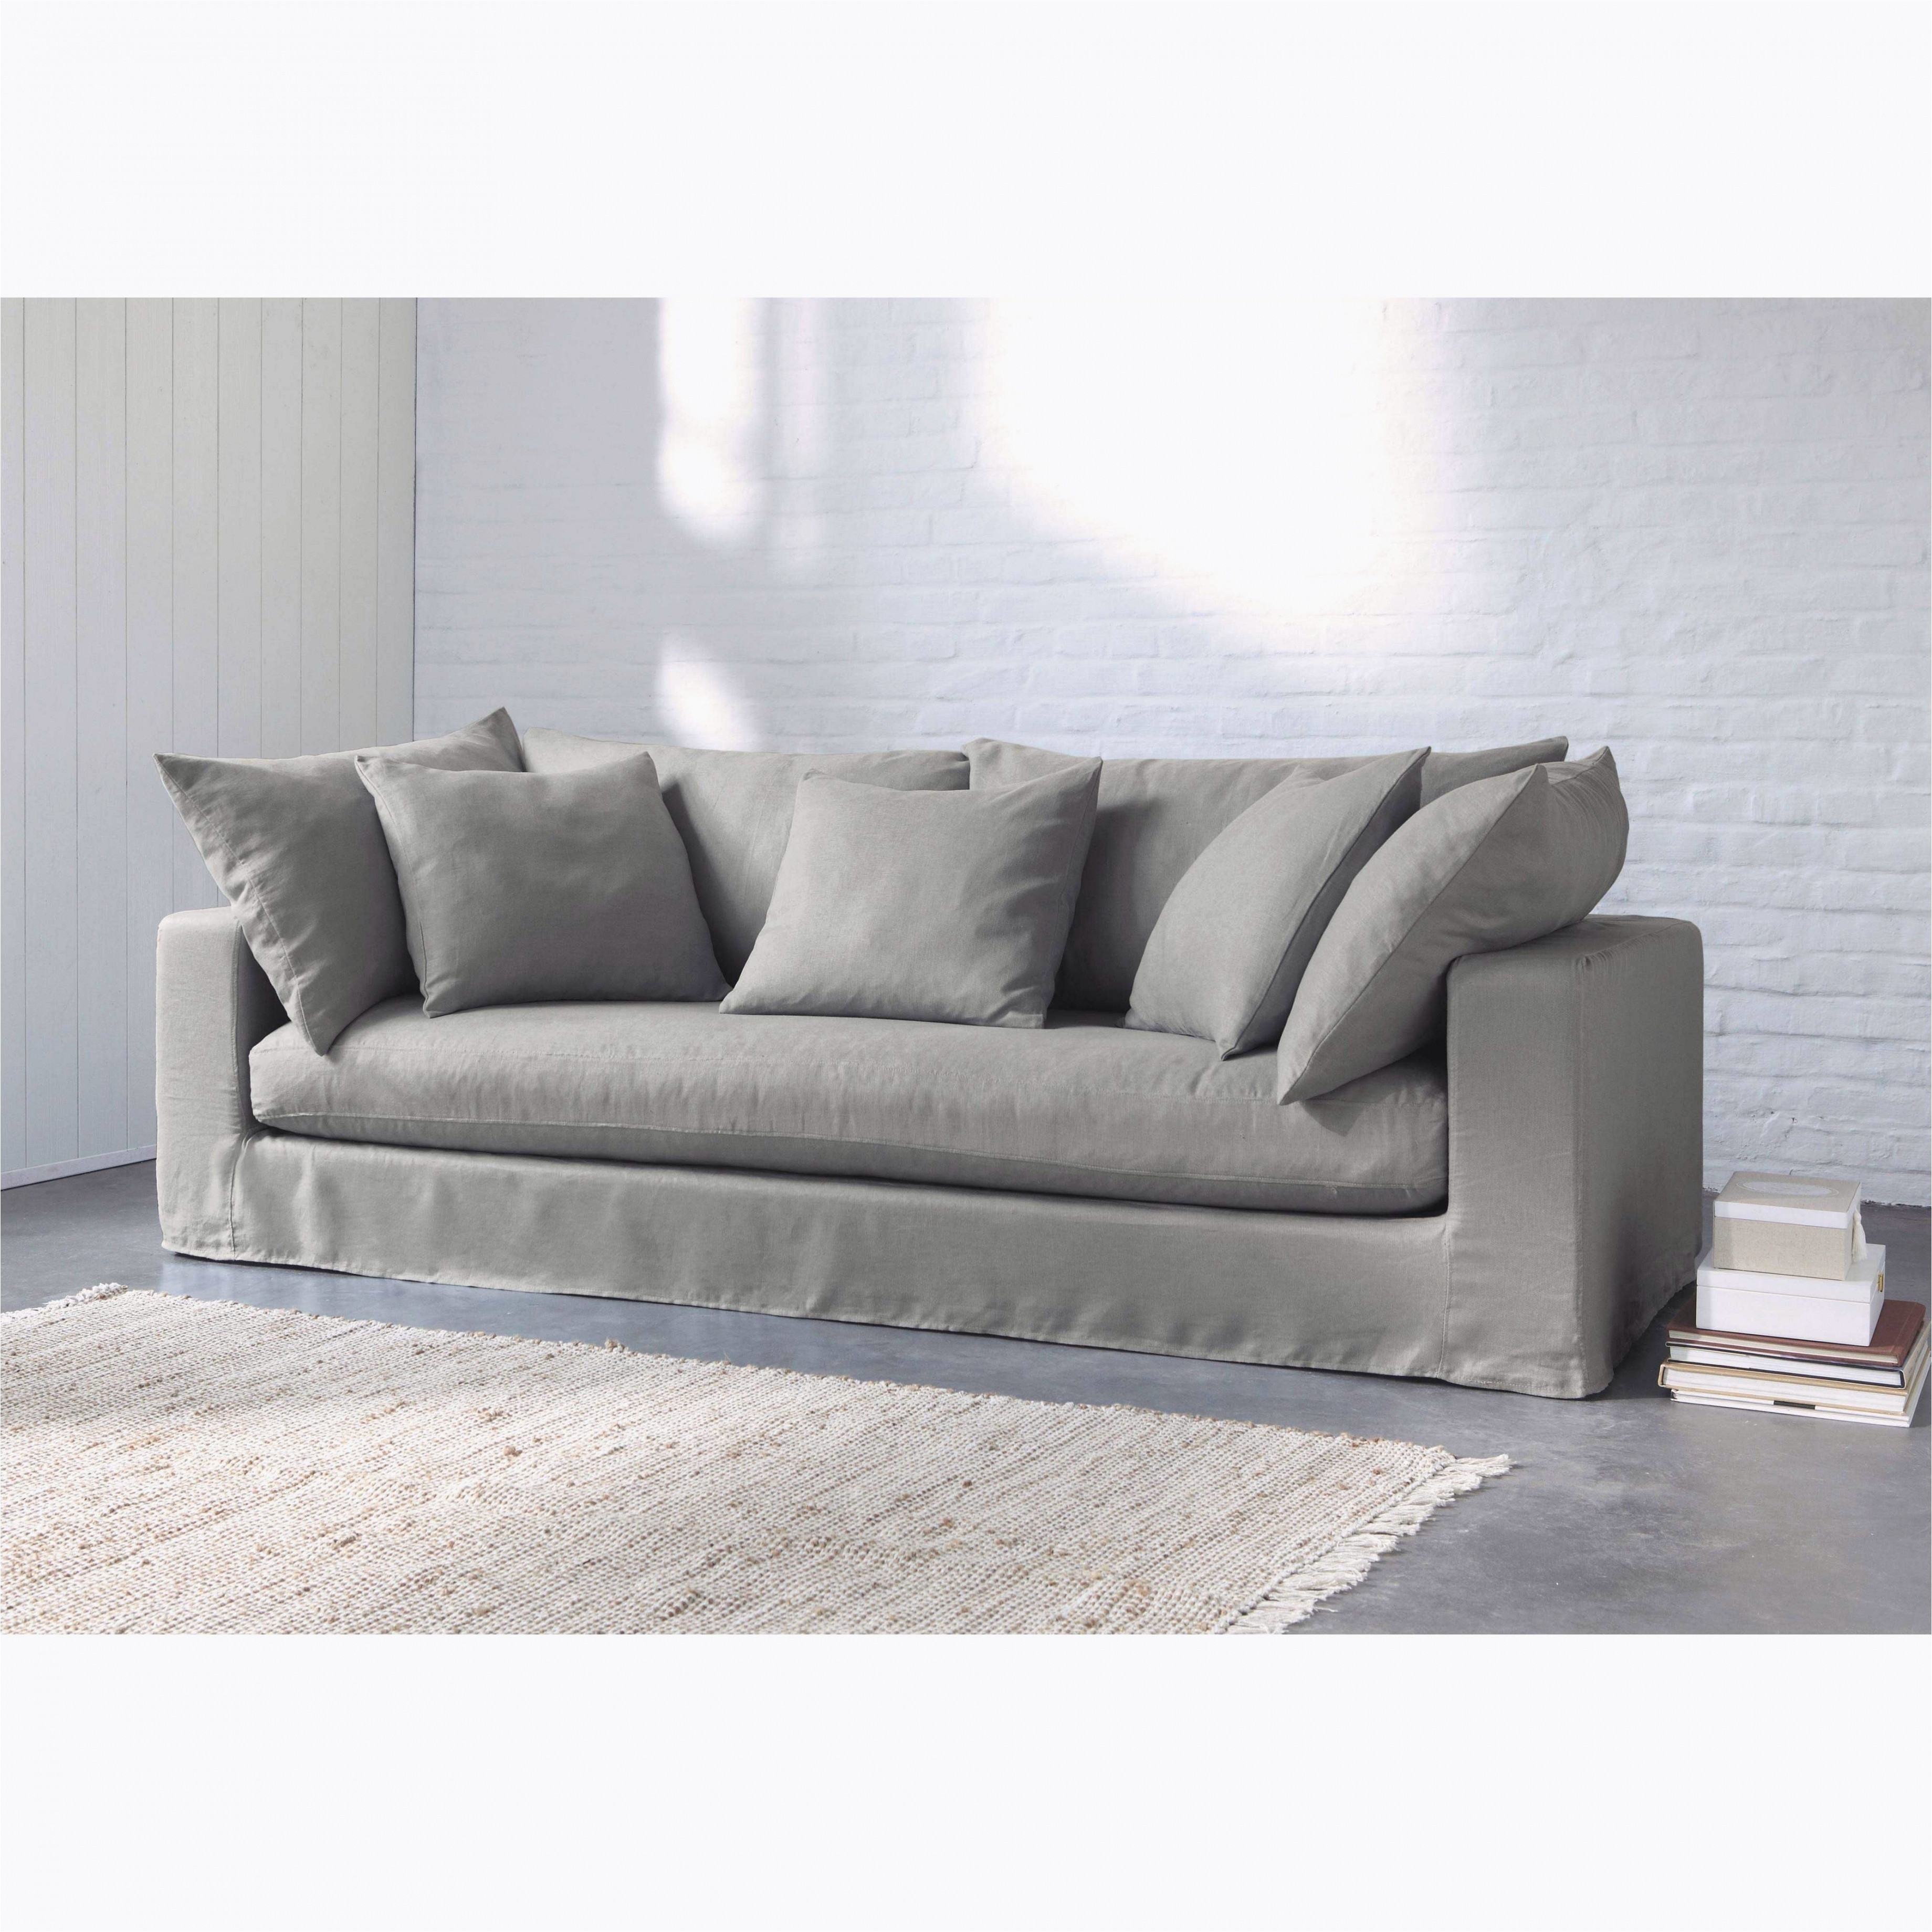 cojines para sofas baratos elegant fundas para sofapictures